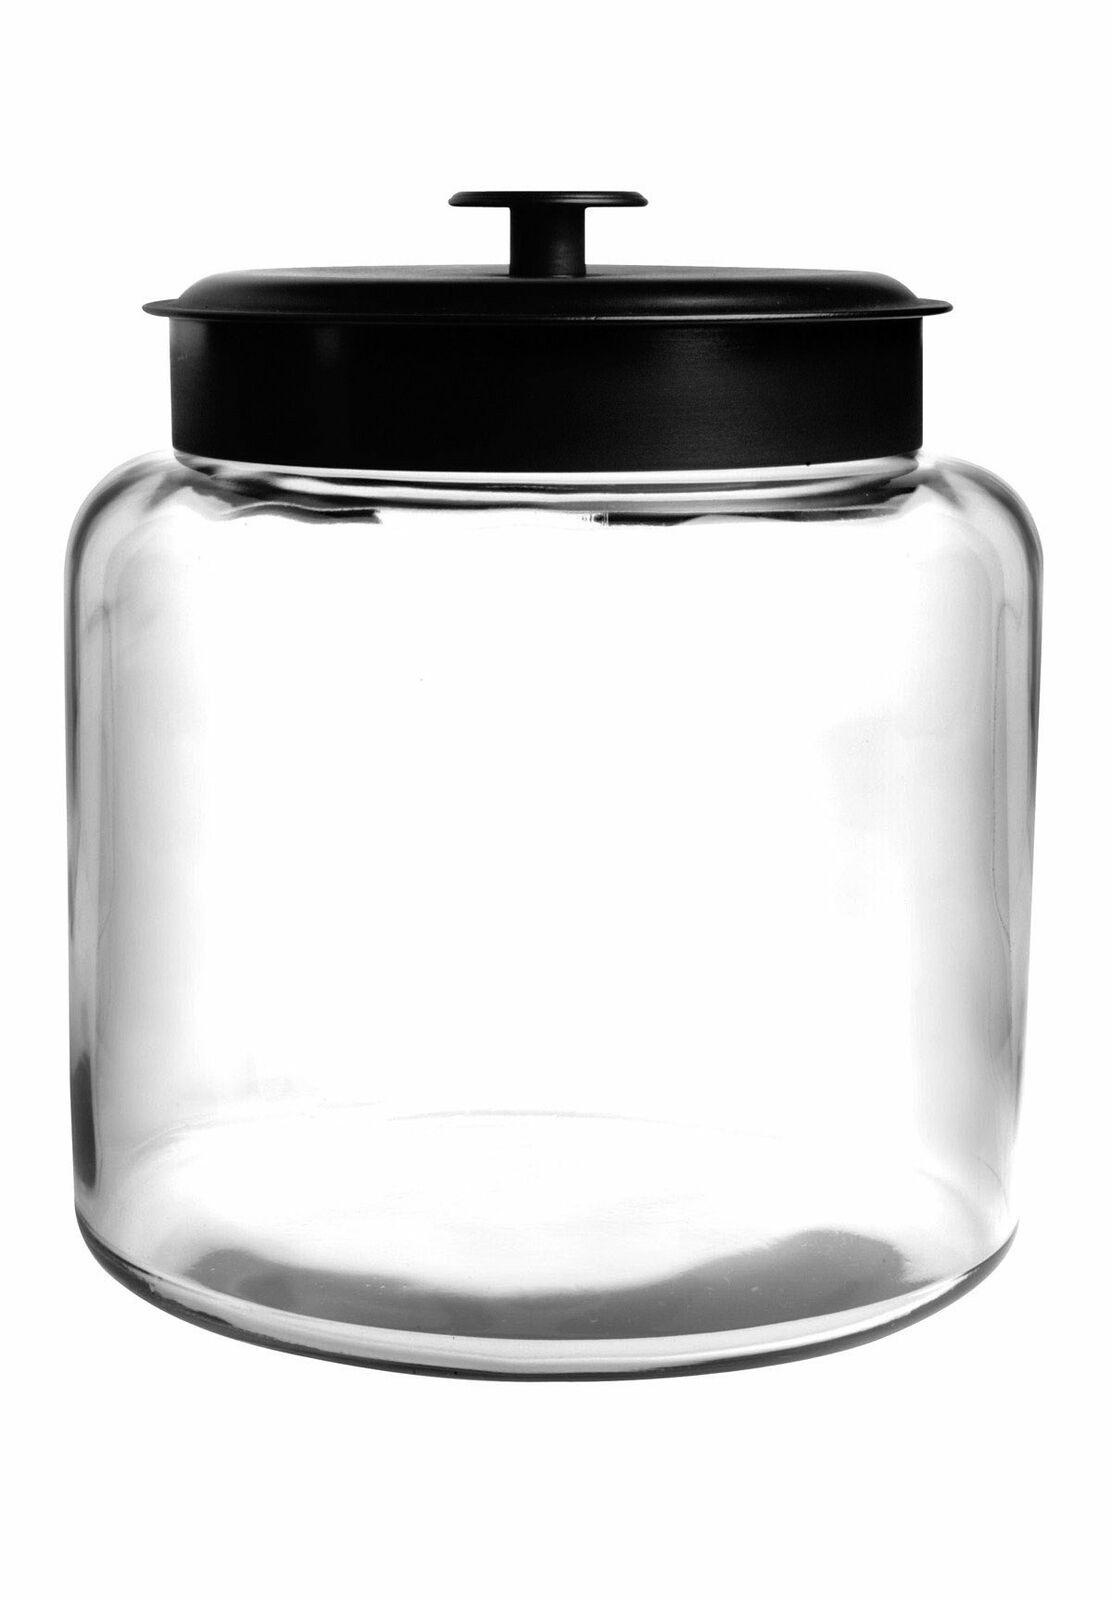 Anchor Hocking 88904 1.5 gallon Montana Jar with Black Metal